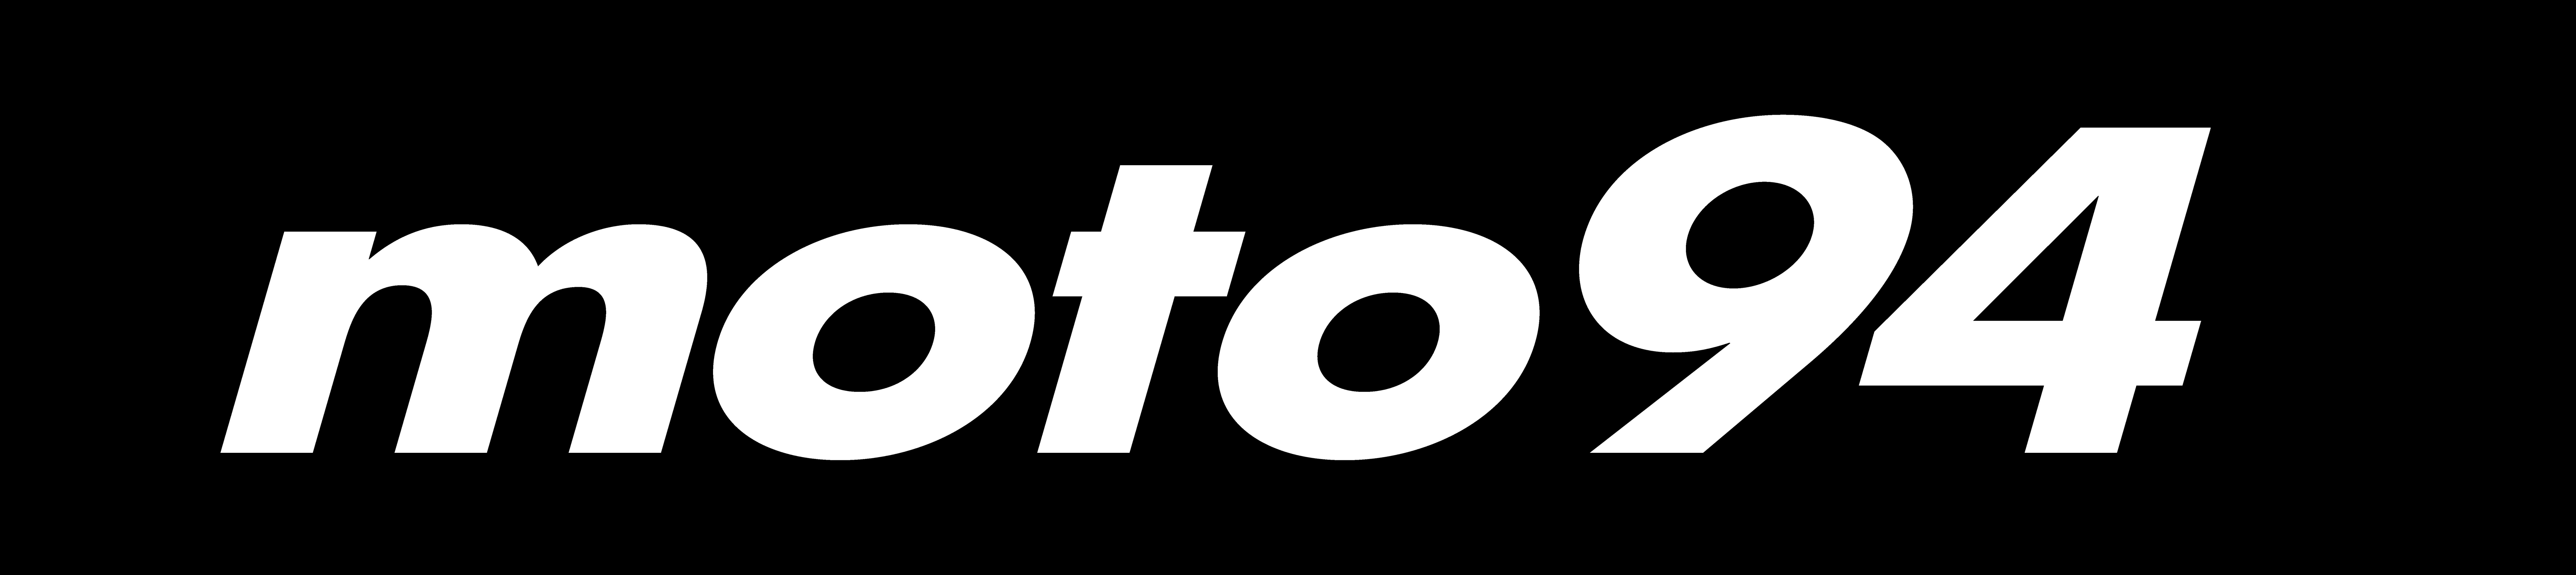 Moto94